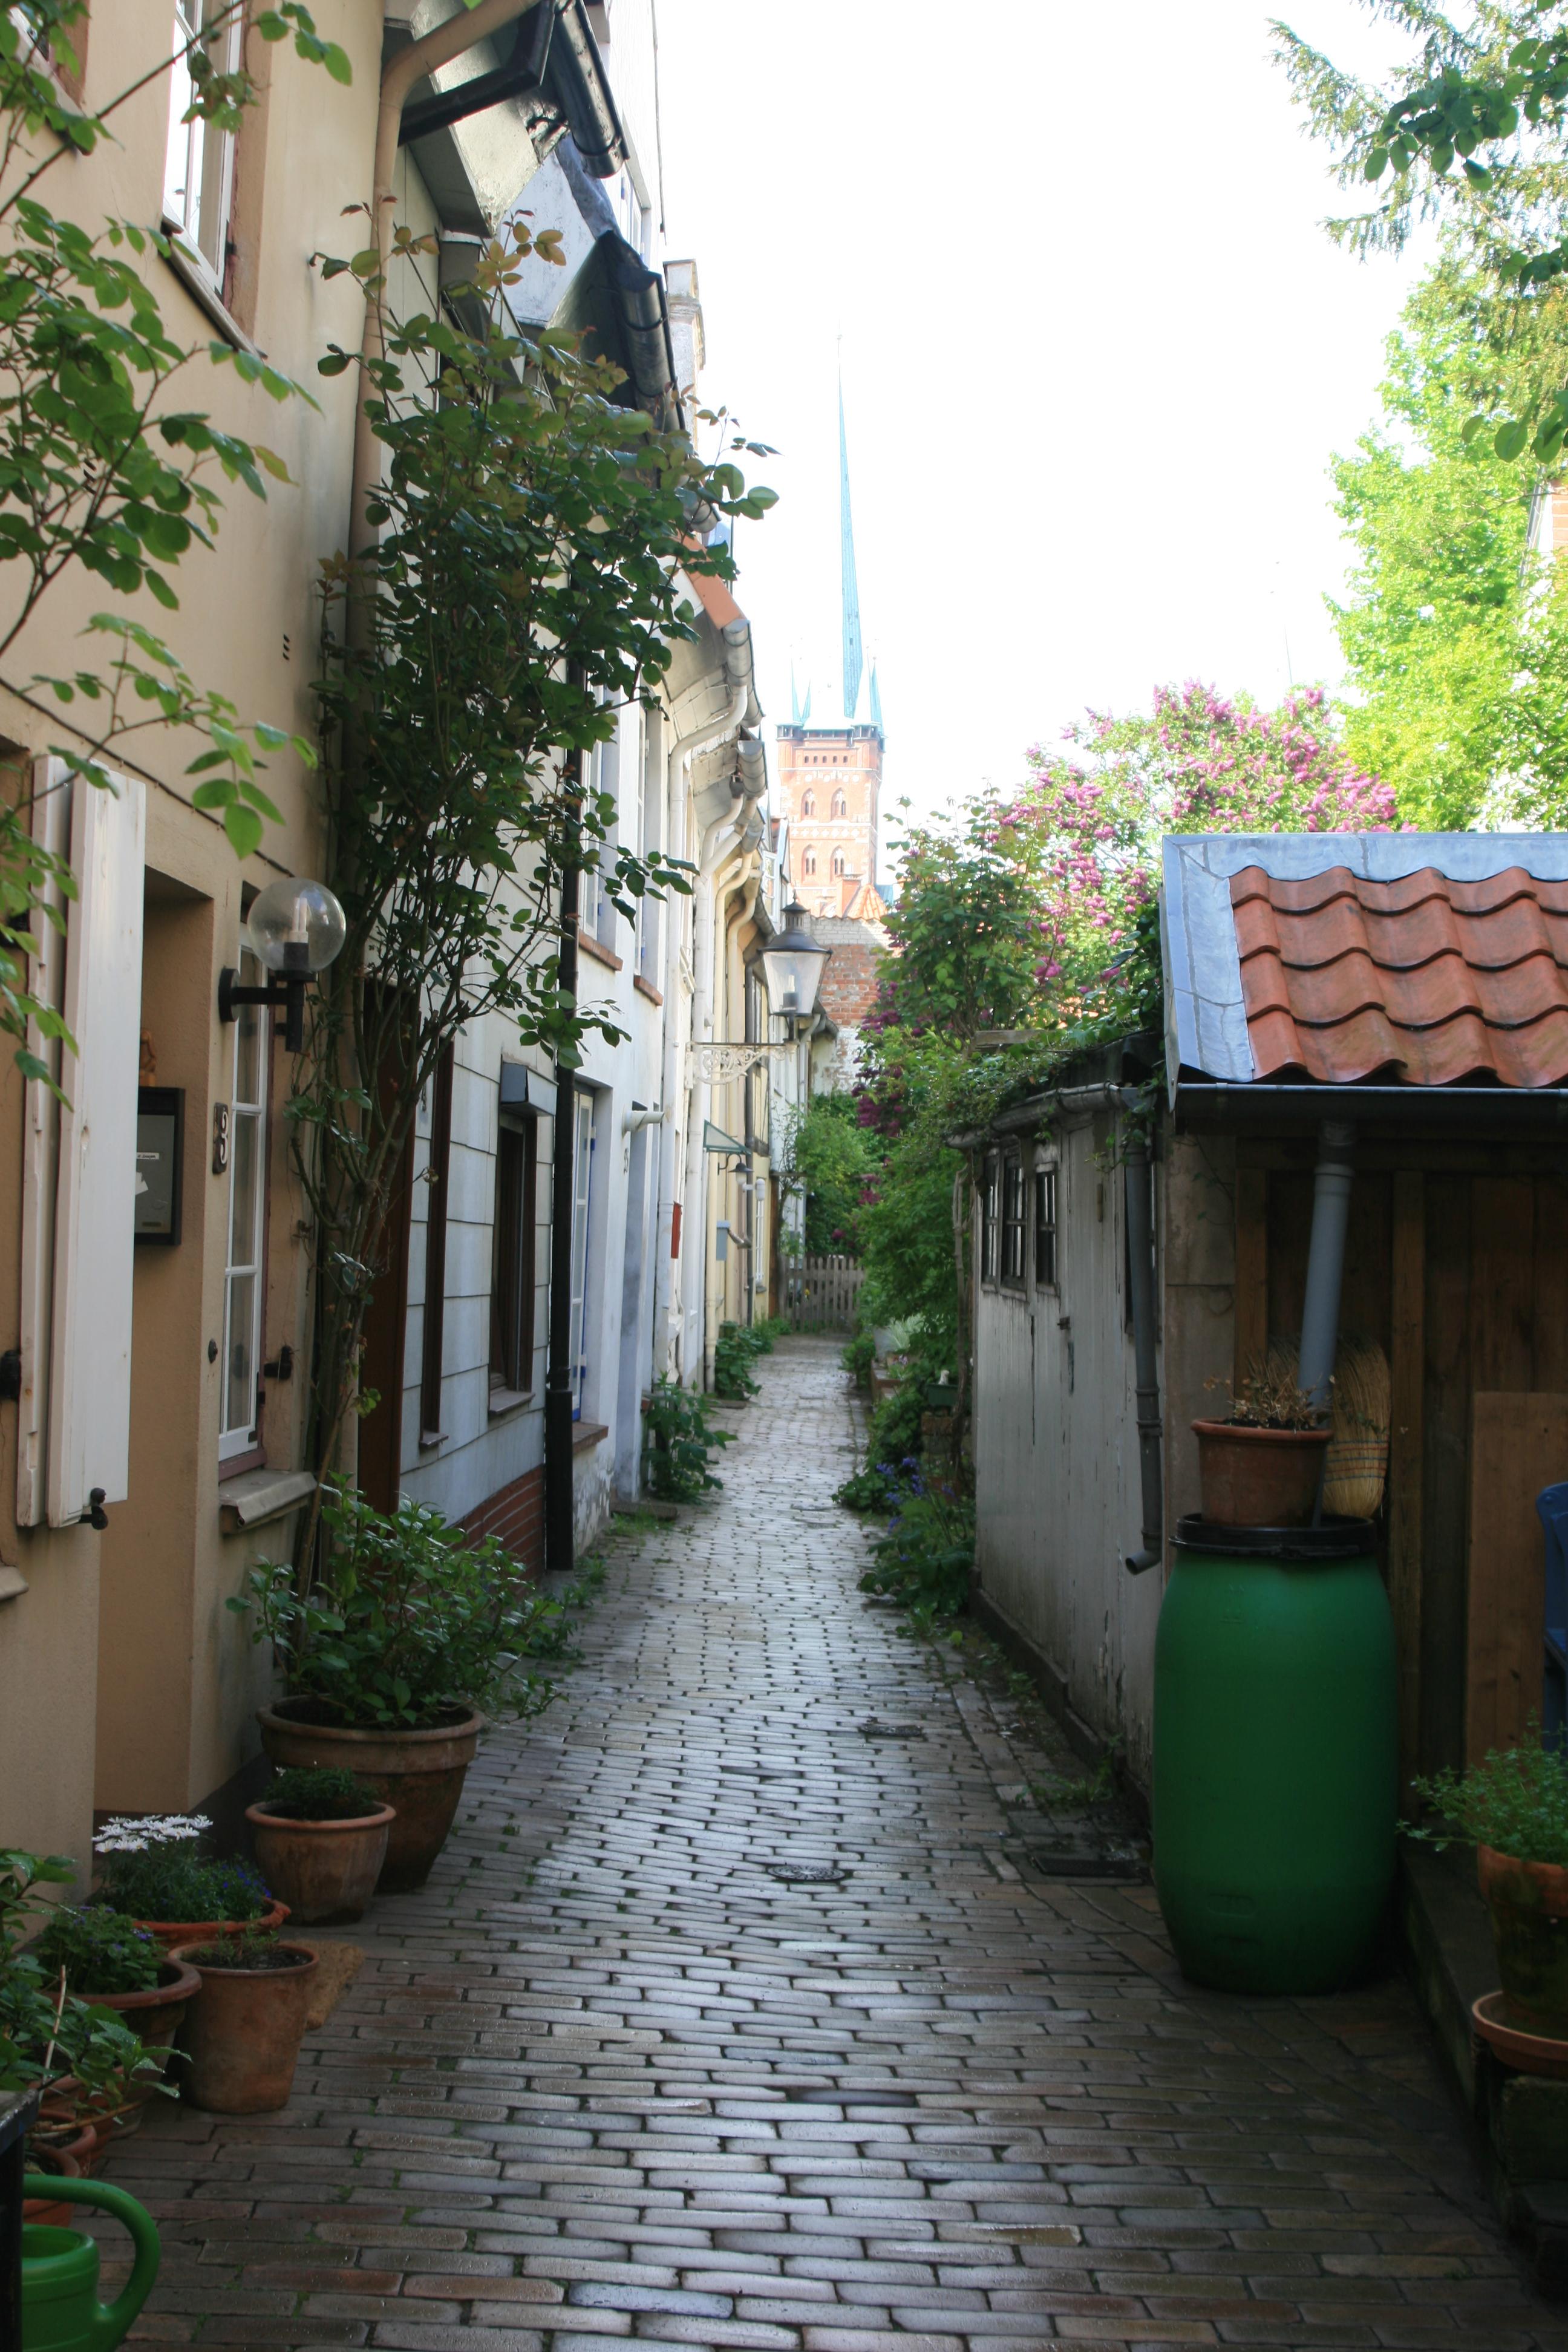 Lübeck Urlaub Tipps – Lübeck Altstadt Spaziergang